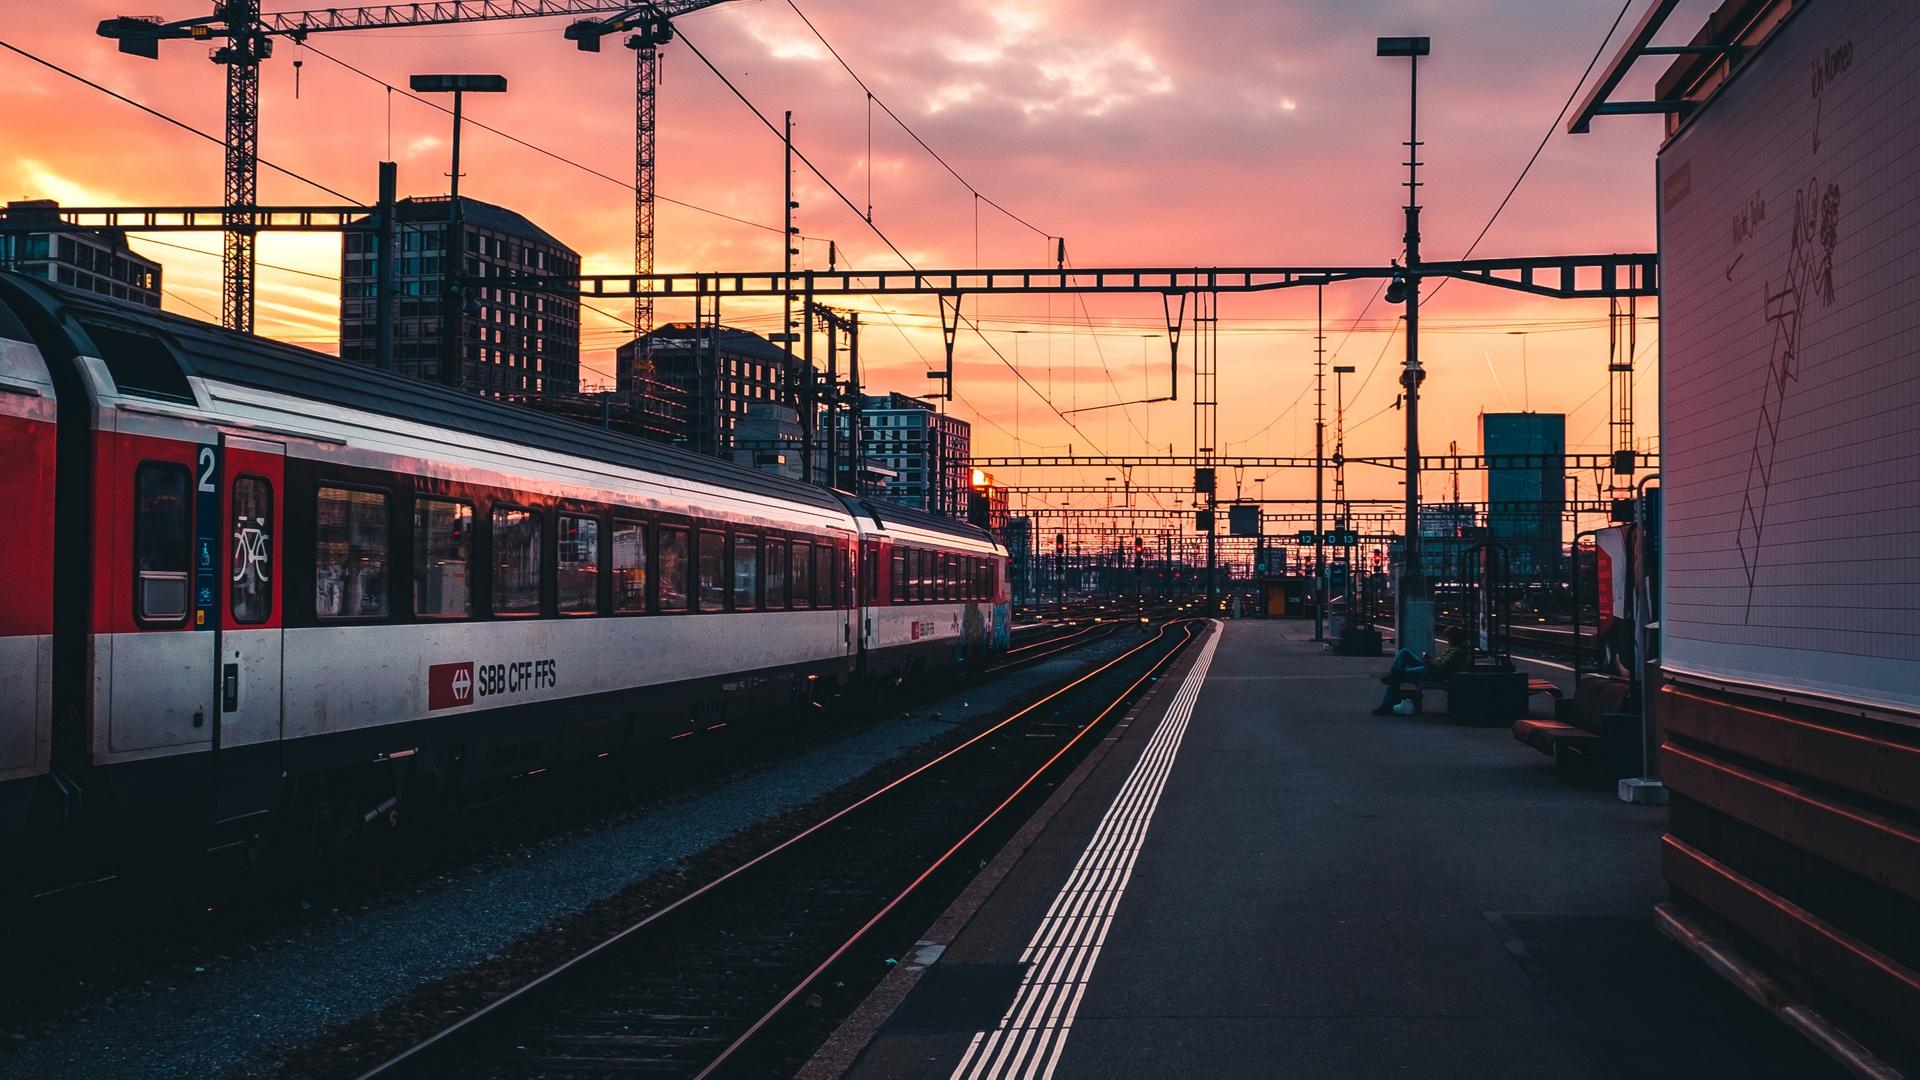 Wallpaper Railway Railroad Track Train Station Sunset